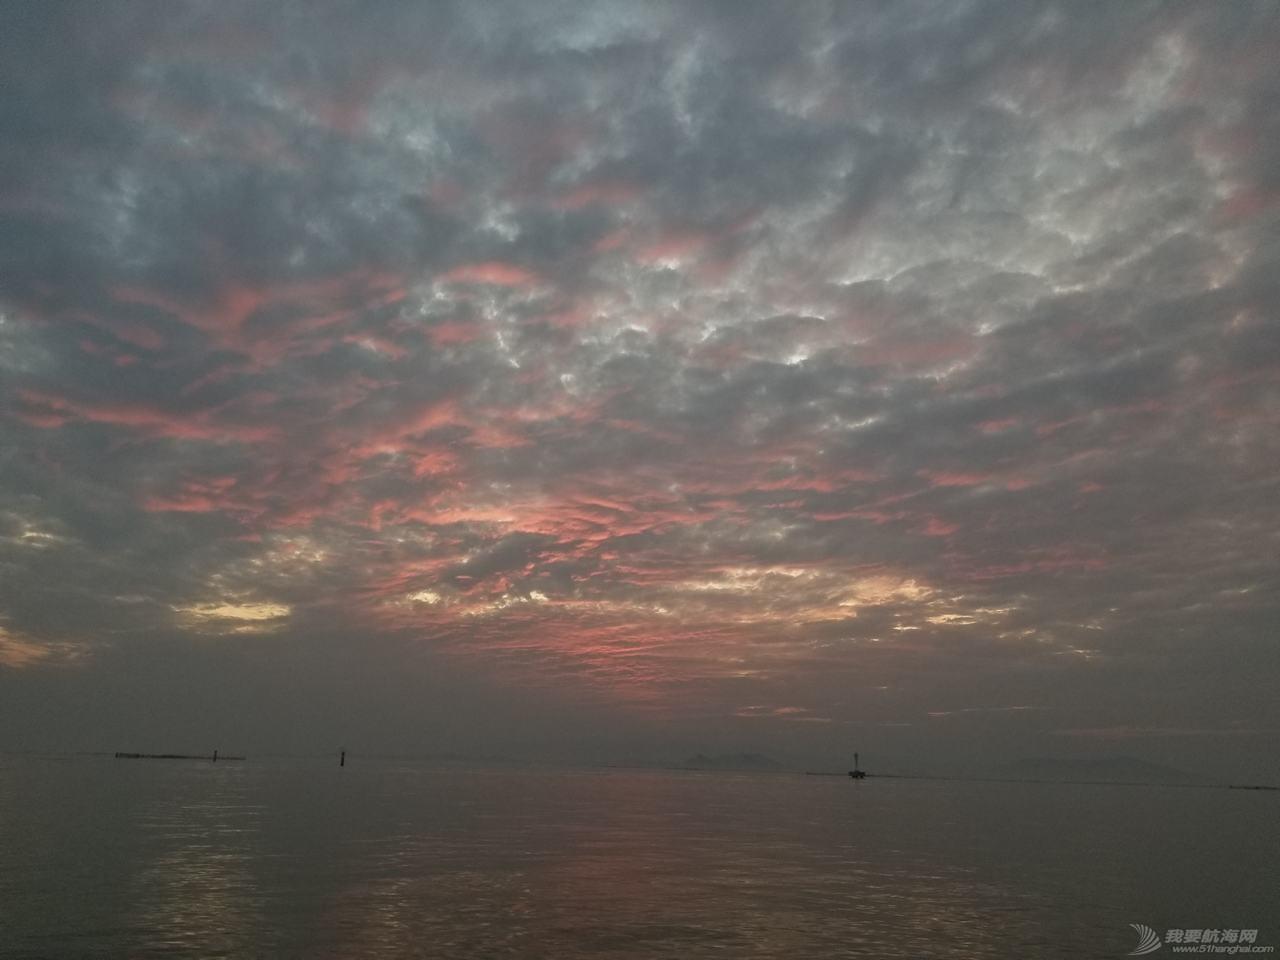 nbsp,到了,航海,我们,帆船 人生中的第一次--2017环太湖帆船赛  234021bhdssmjmo9rjr22r